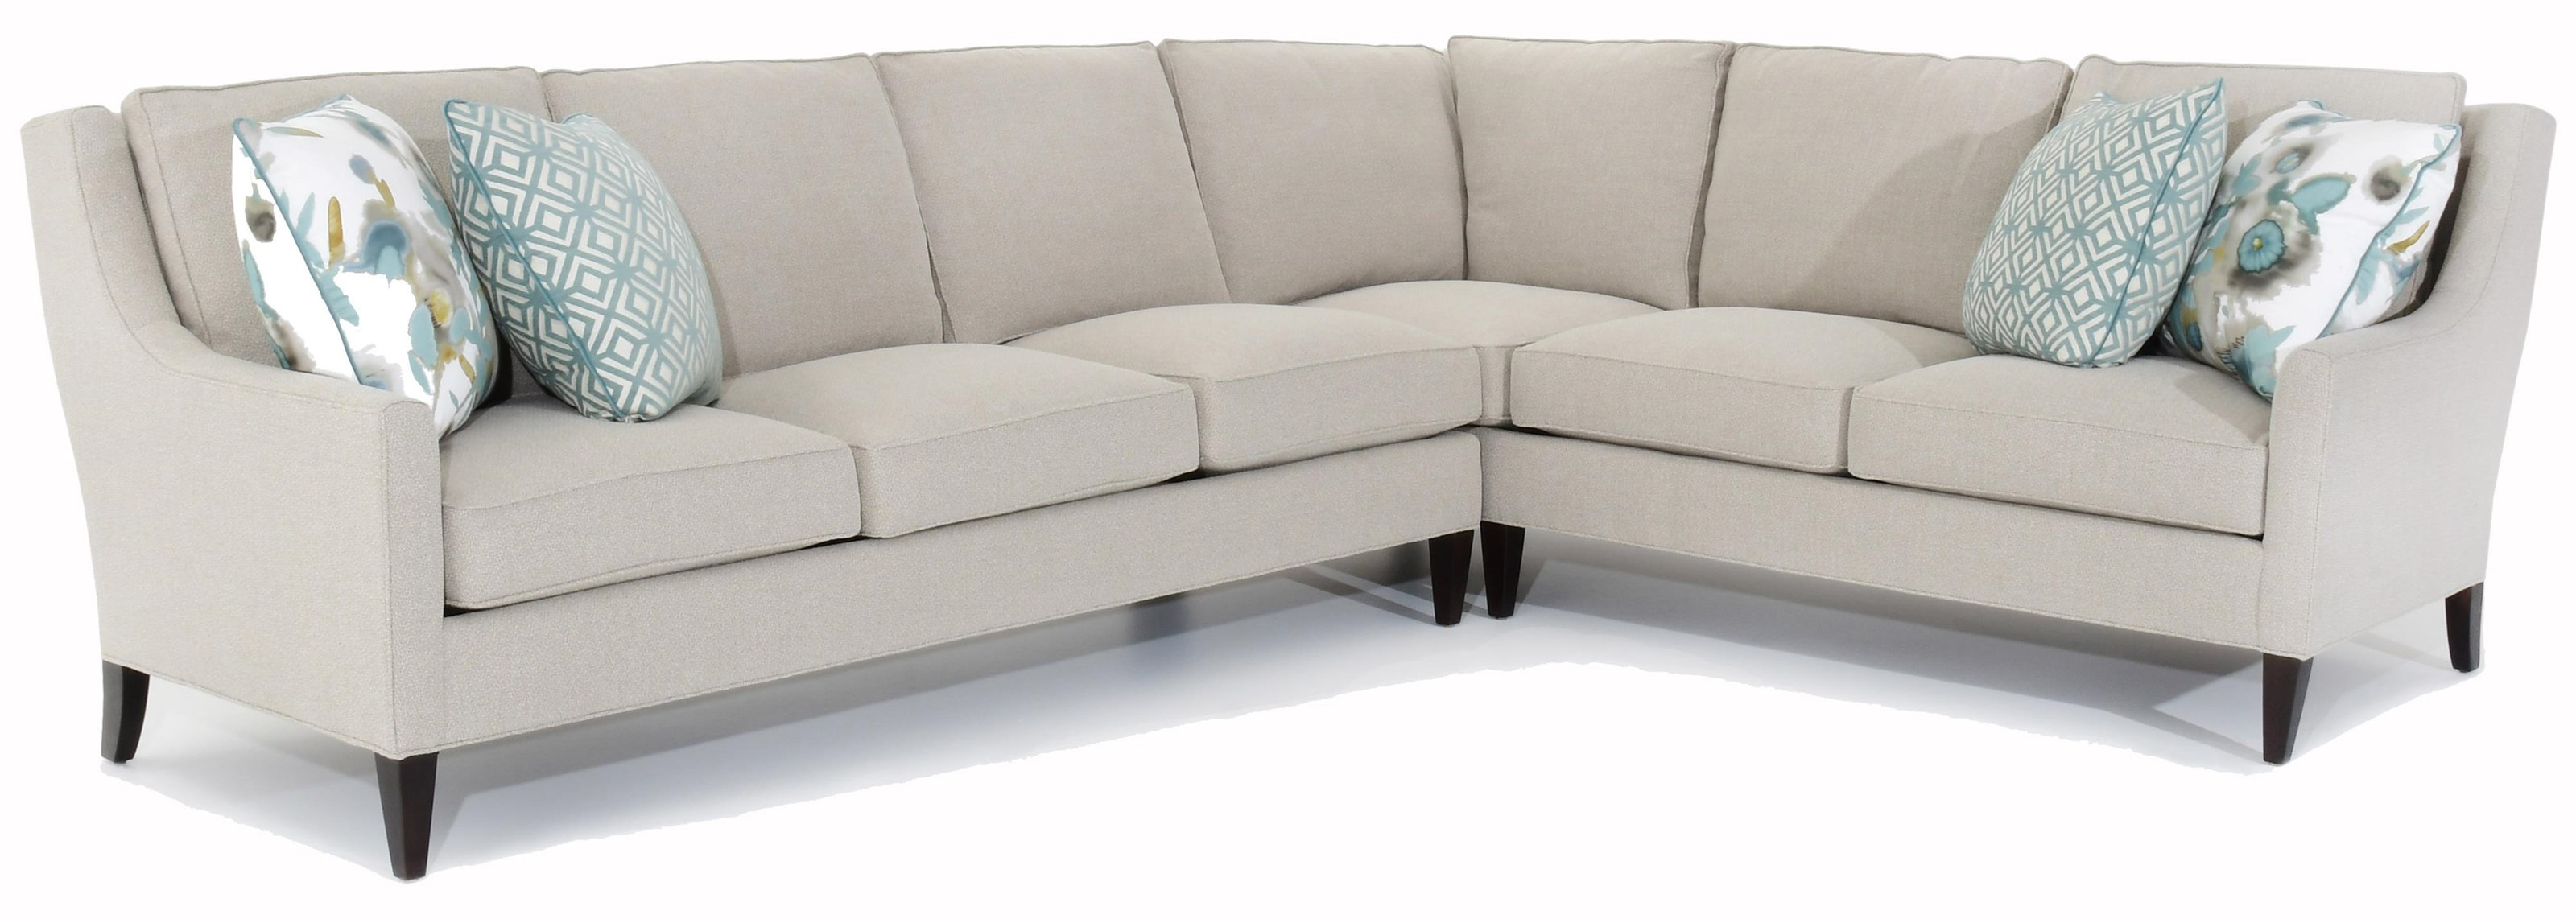 Laguna Sectional Sofa by Huntington House at Baer's Furniture